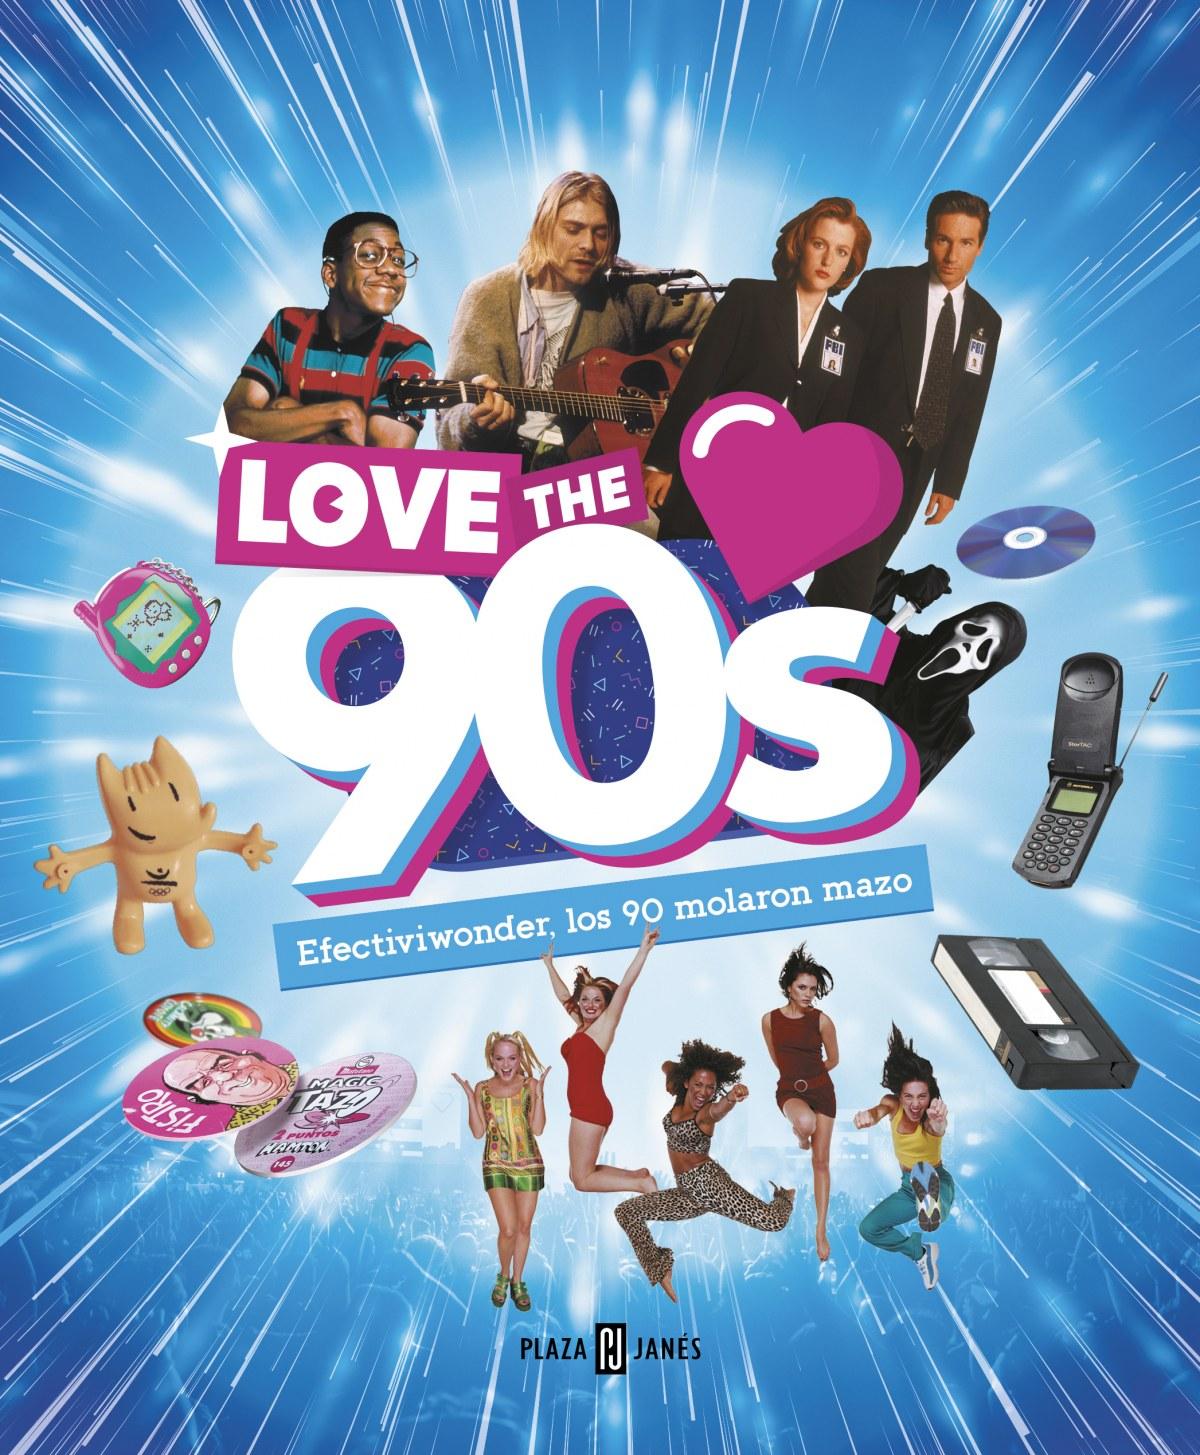 LOVE THE 90S. EFECTIVIWONDER, LOS 90 MOLARON MAZO 9788401020988